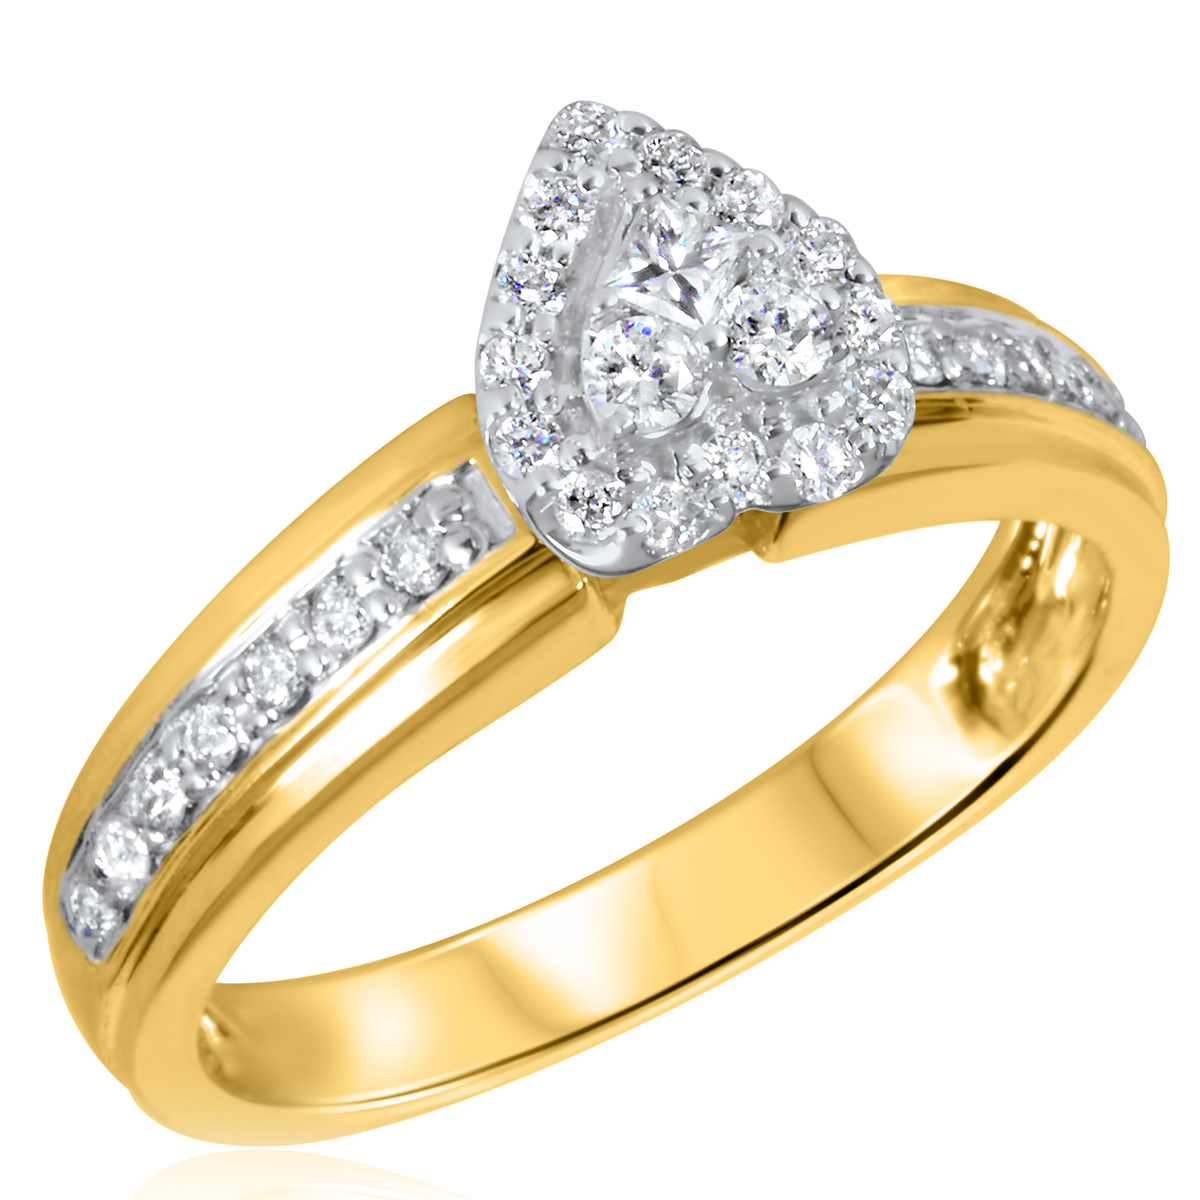 3/8 CT. T.W. Diamond Ladies Engagement Ring 14K Yellow Gold- Size 8